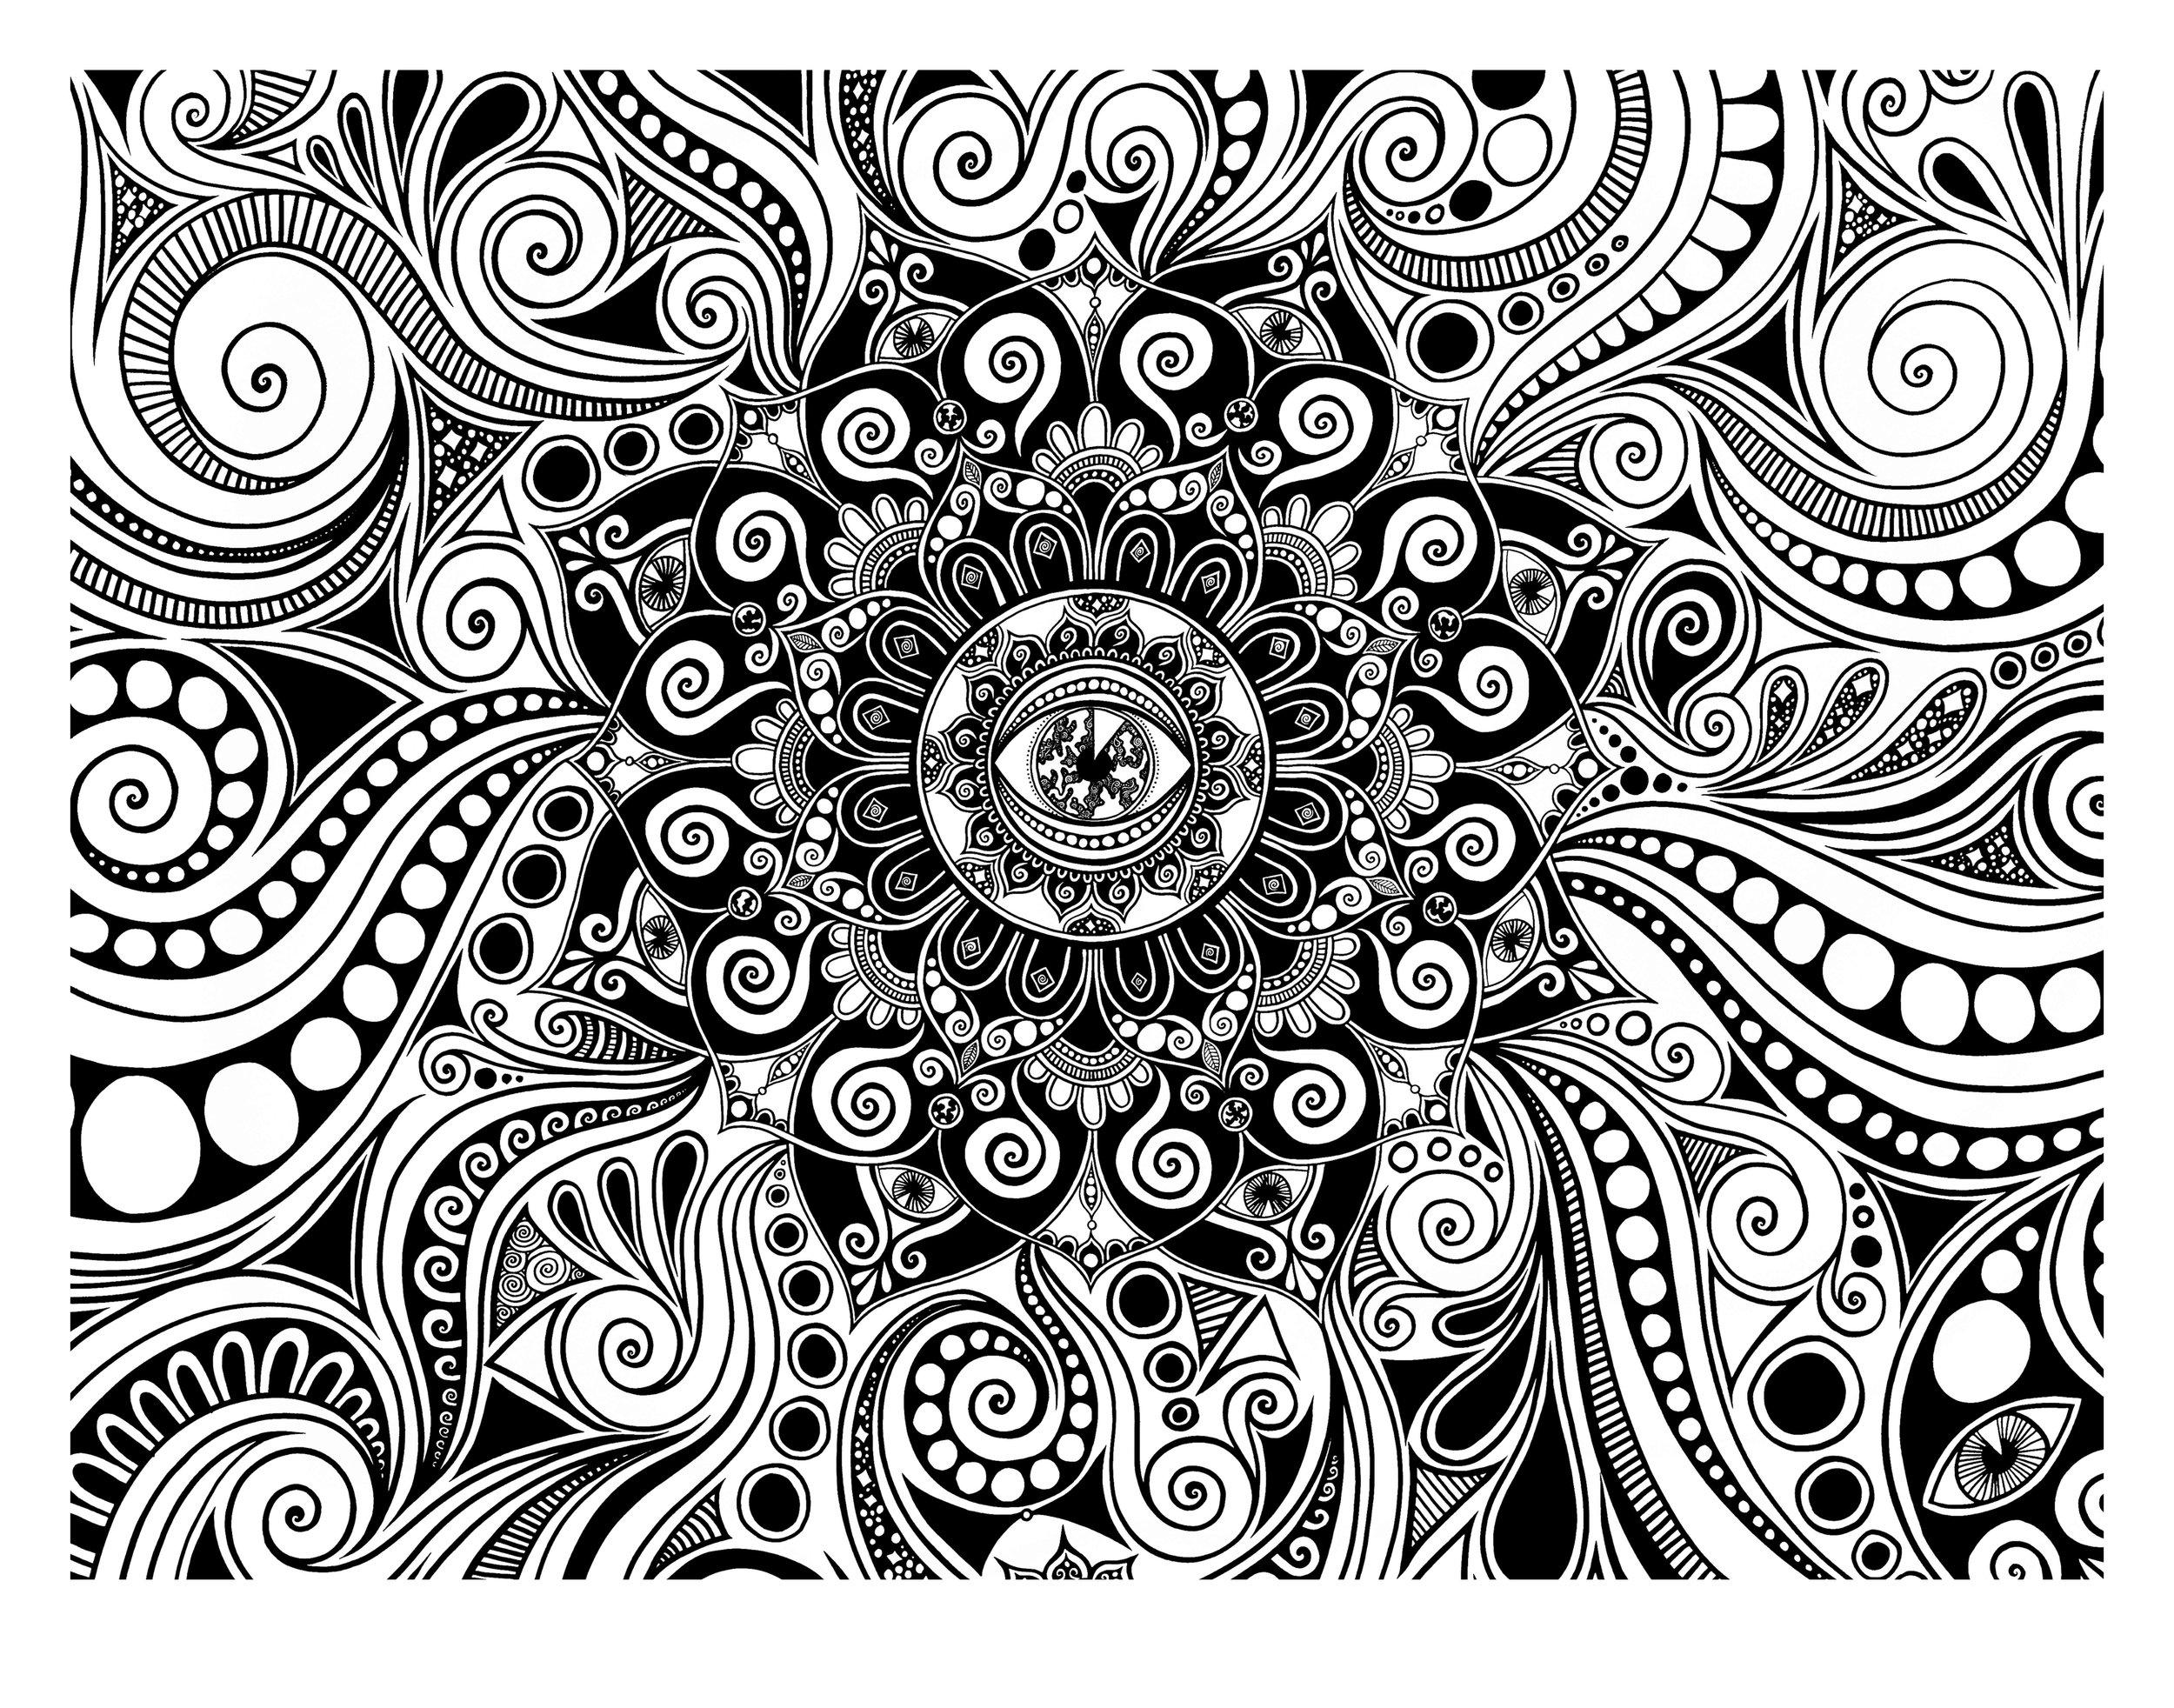 14x11 - One Universe - fortyonehundred copy.jpg